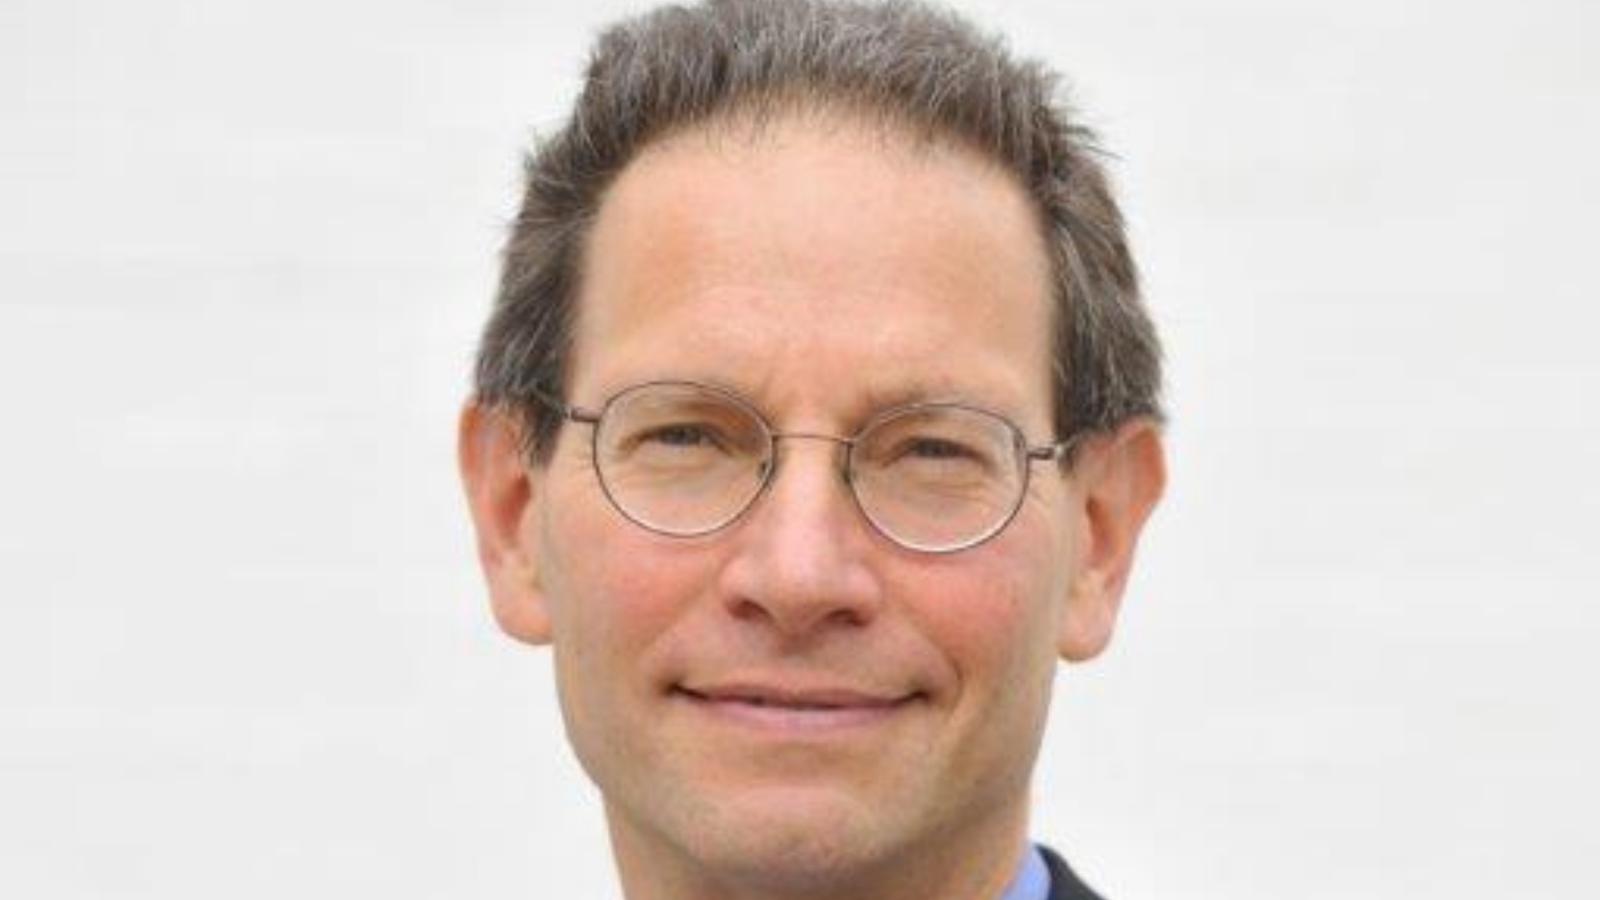 Profile photo of Charles Kupchan